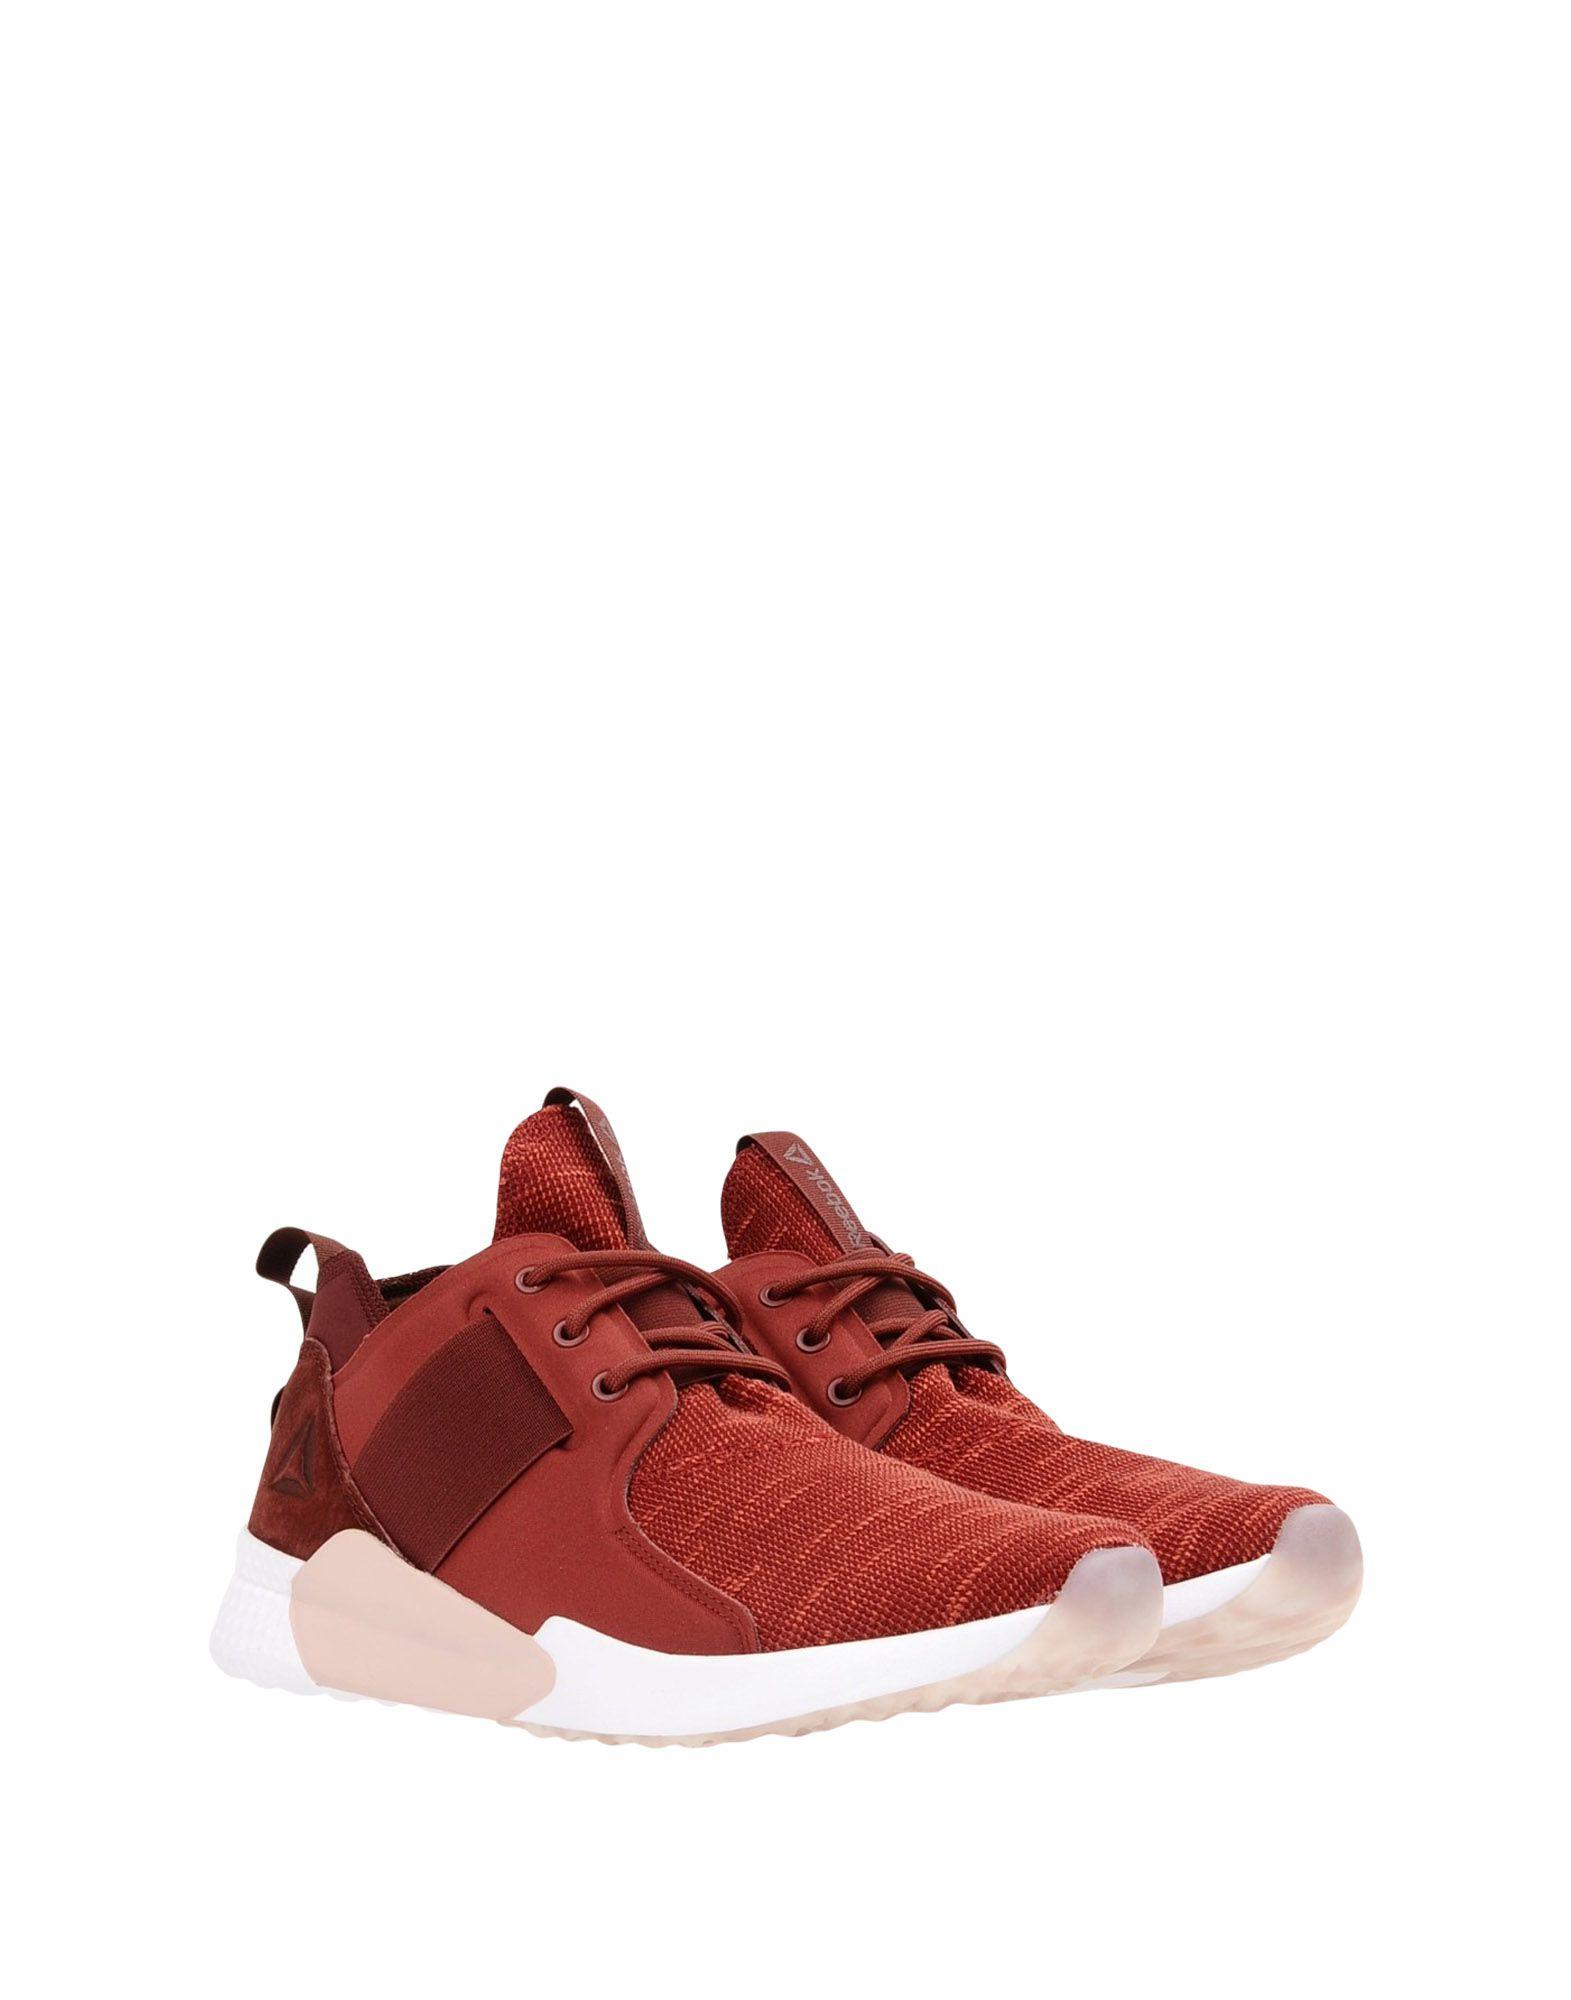 Sneakers Reebok Guresu 1.0 - Donna - 11371783US